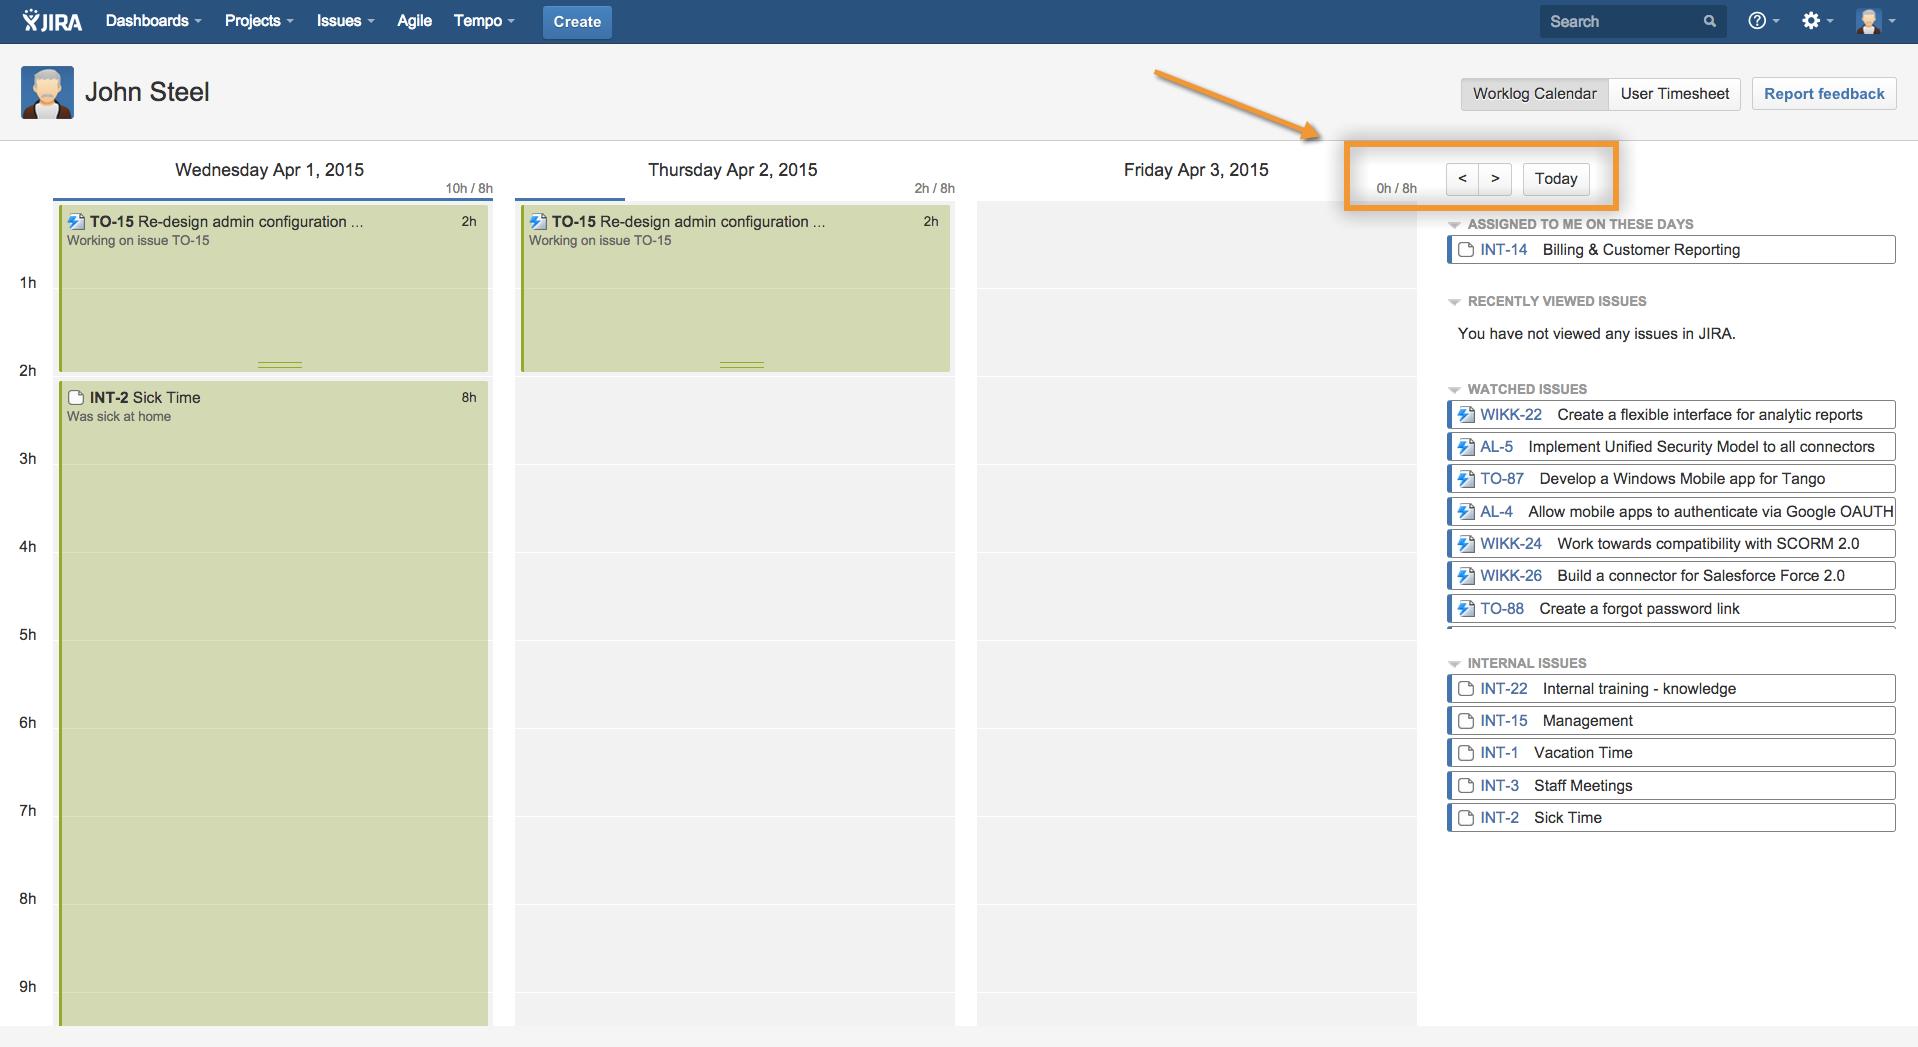 Navigating between days in the Worklog Calendar